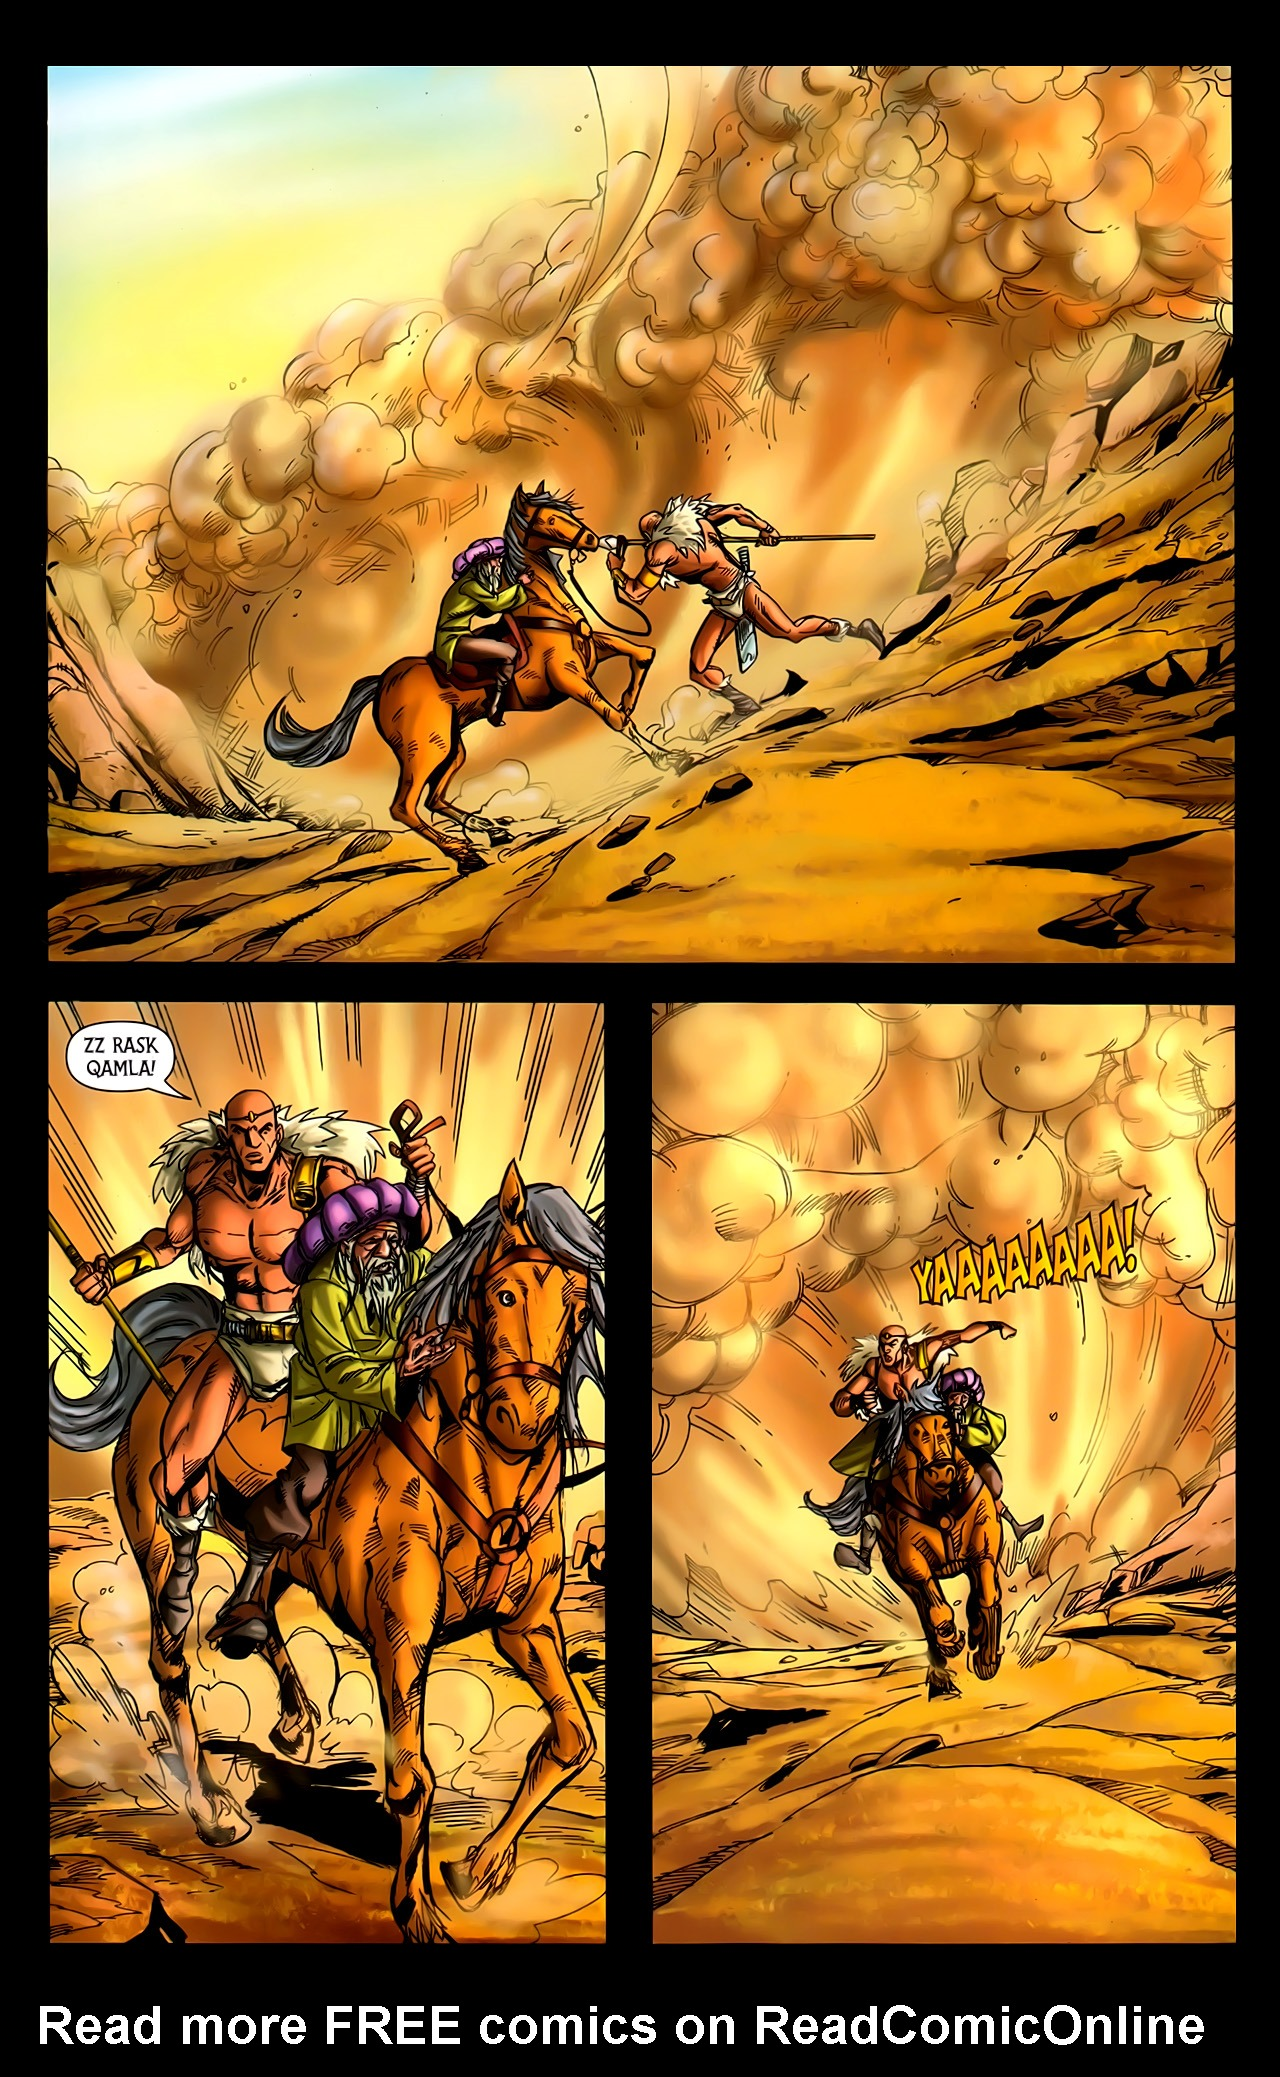 Read online 1001 Arabian Nights: The Adventures of Sinbad comic -  Issue #10 - 22